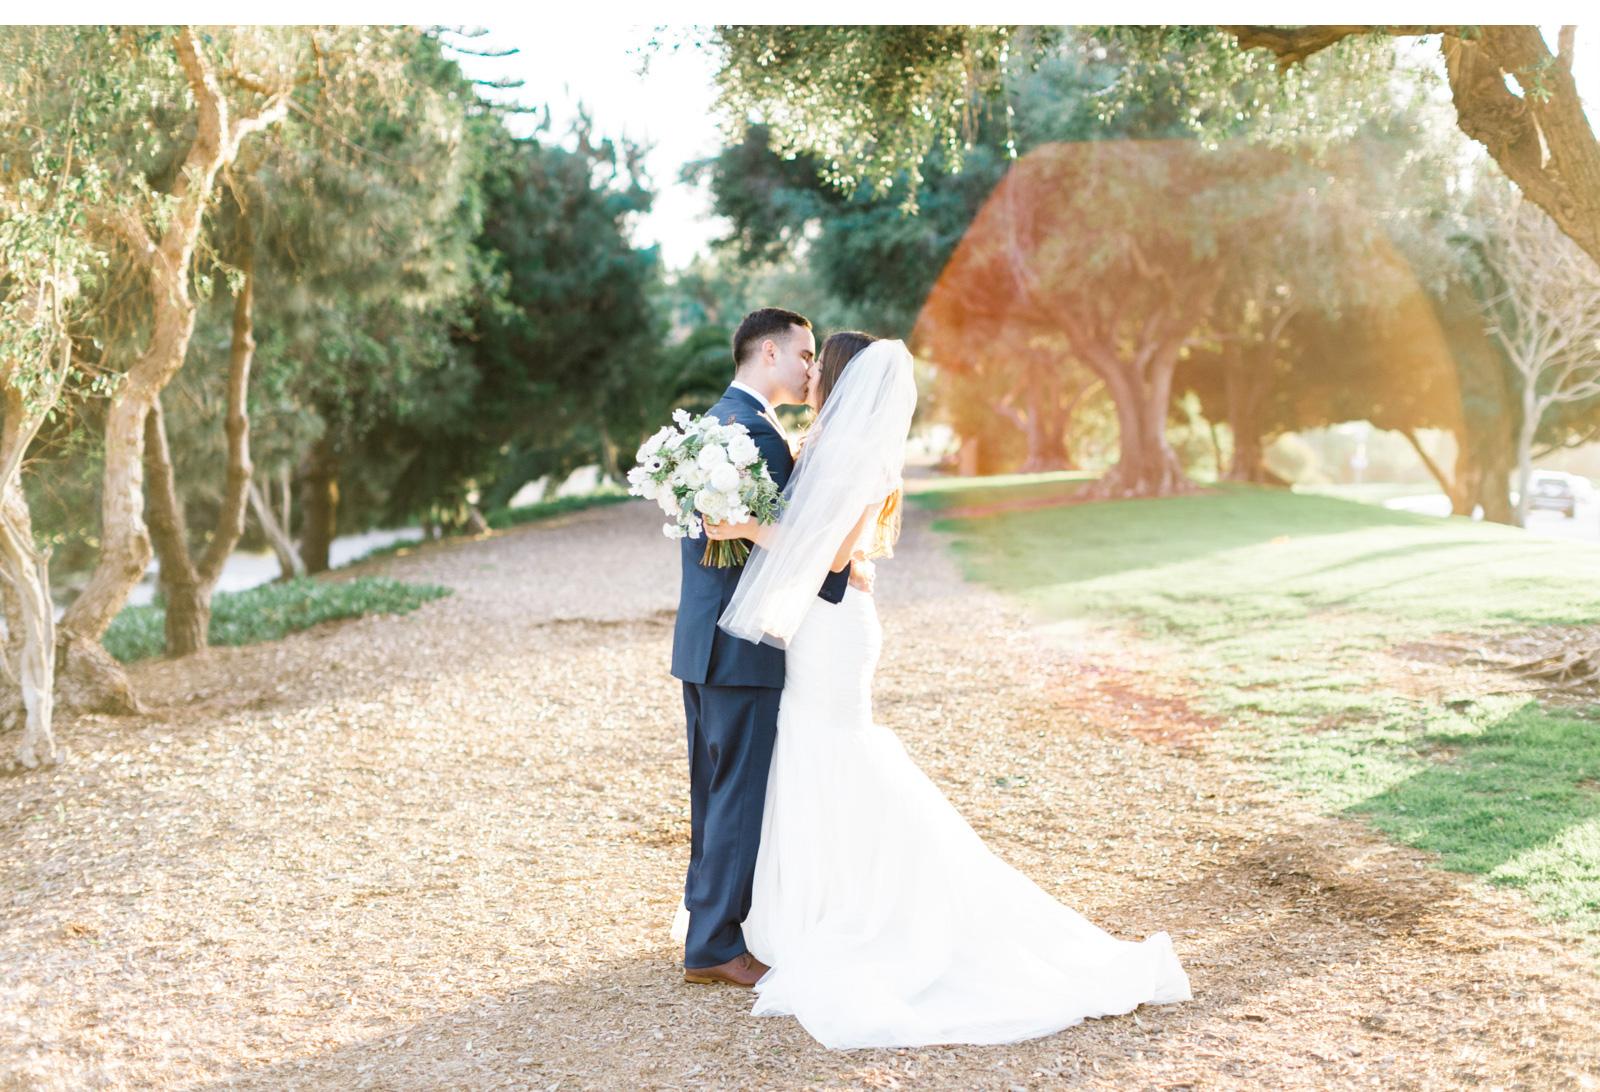 Jon-&-Amanda-Dougher's-Backyard-Wedding-Natalie-Schutt-Photography_04.jpg